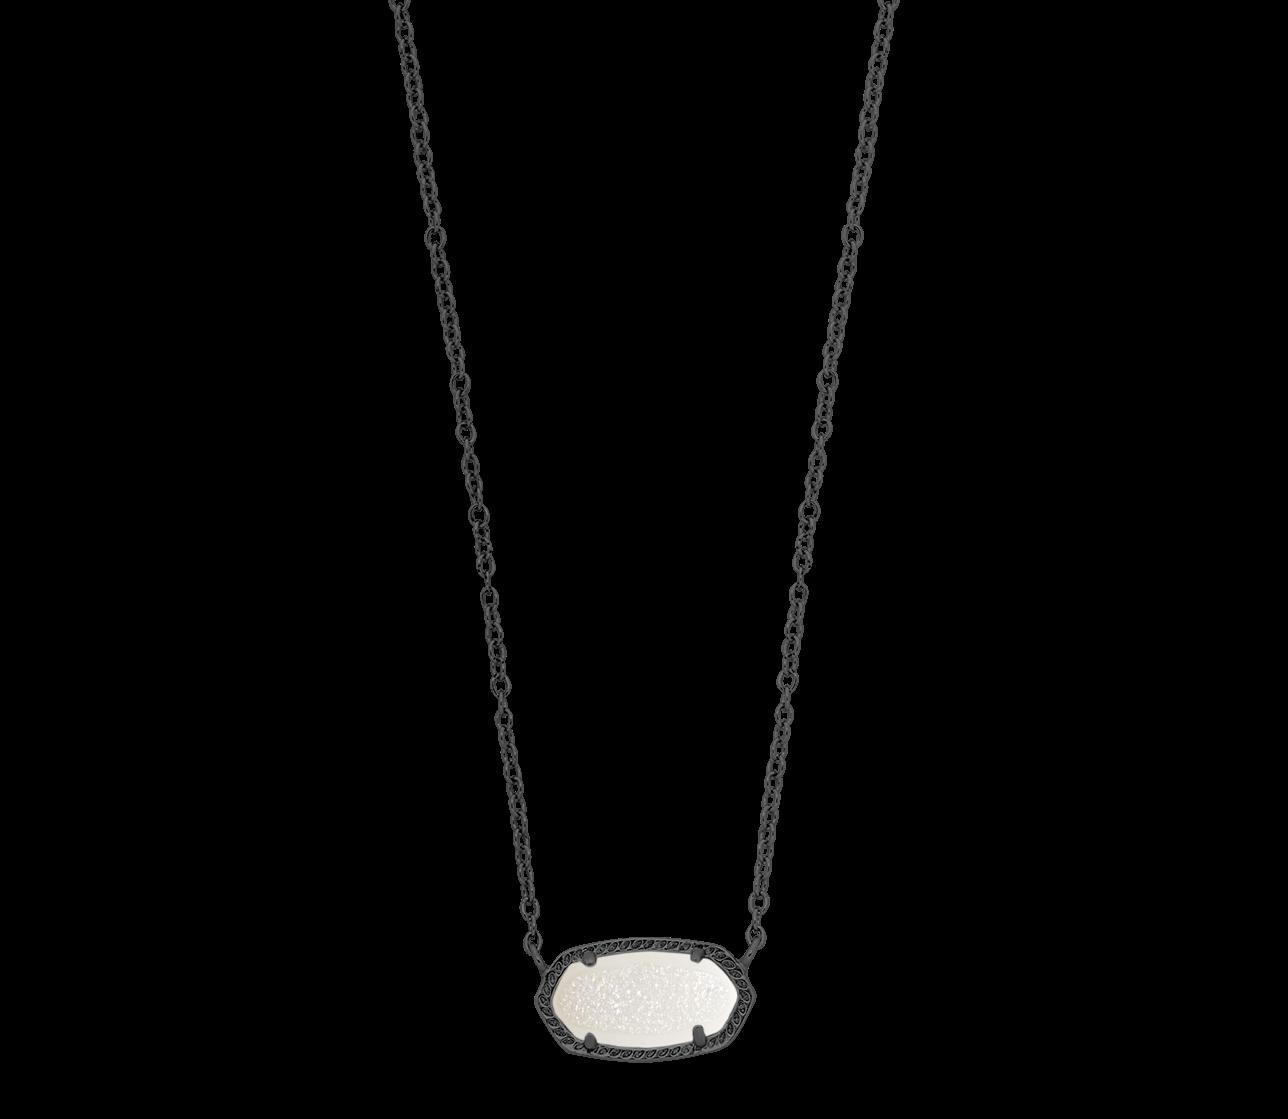 Custom Jewelry Design Your Own Jewelry Kendra Scott cute stuff